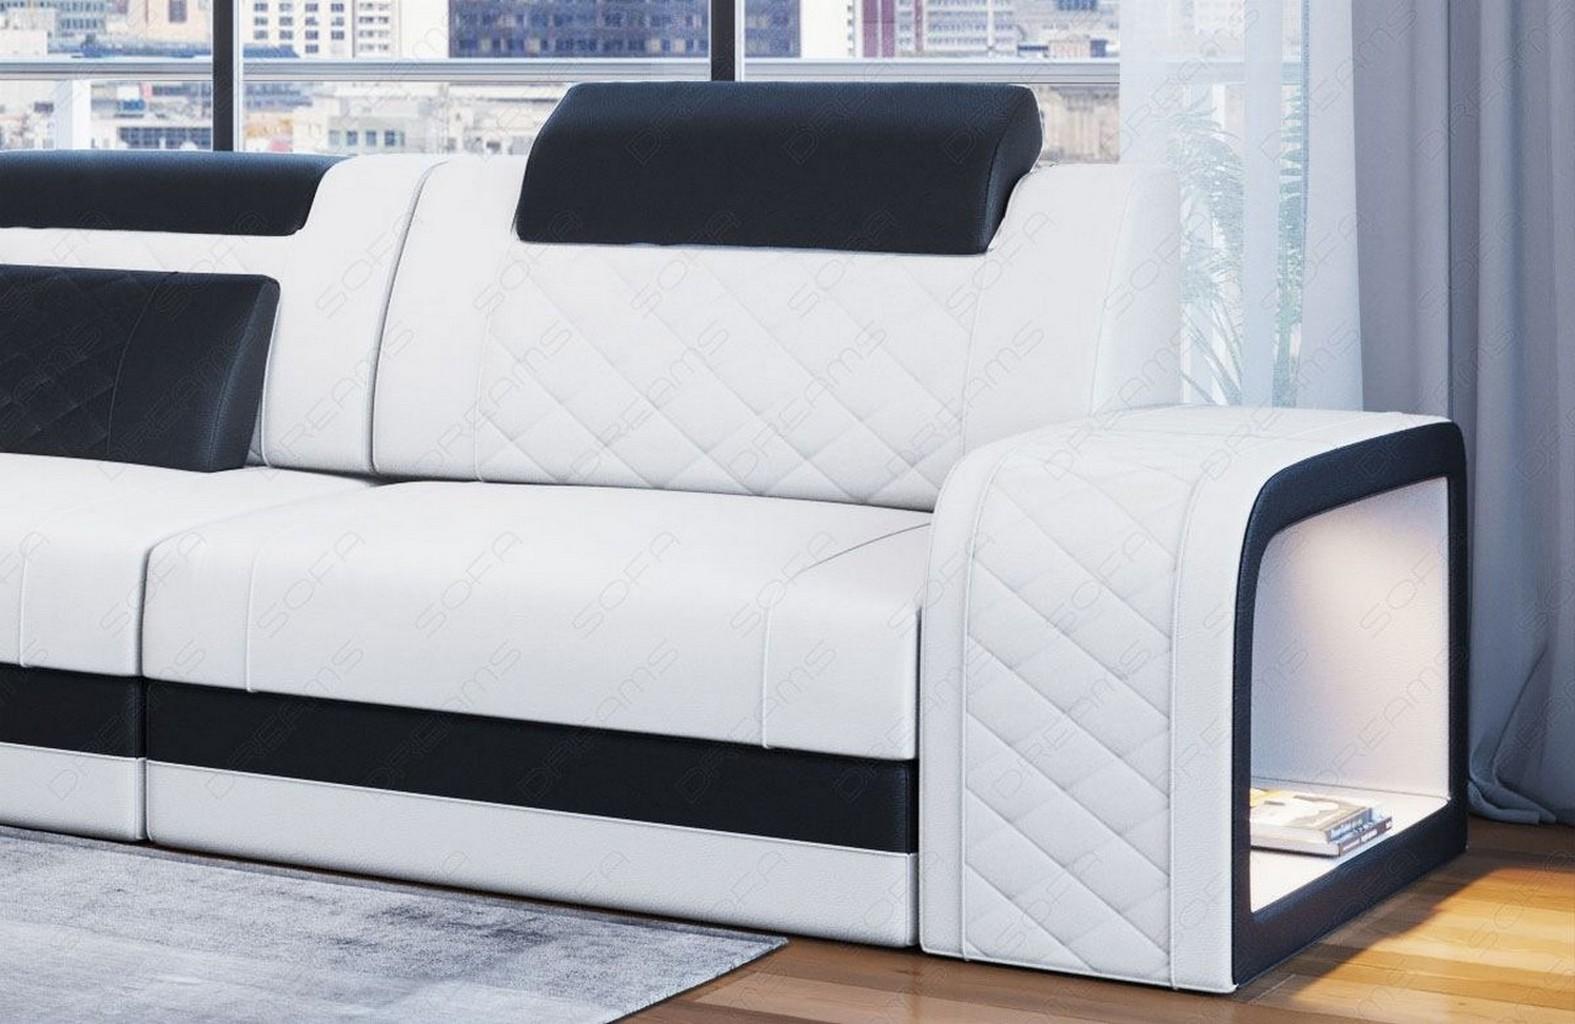 sofa ledersofa couch ecksofa berlin designersofa chesterfield mit led lampen ebay. Black Bedroom Furniture Sets. Home Design Ideas